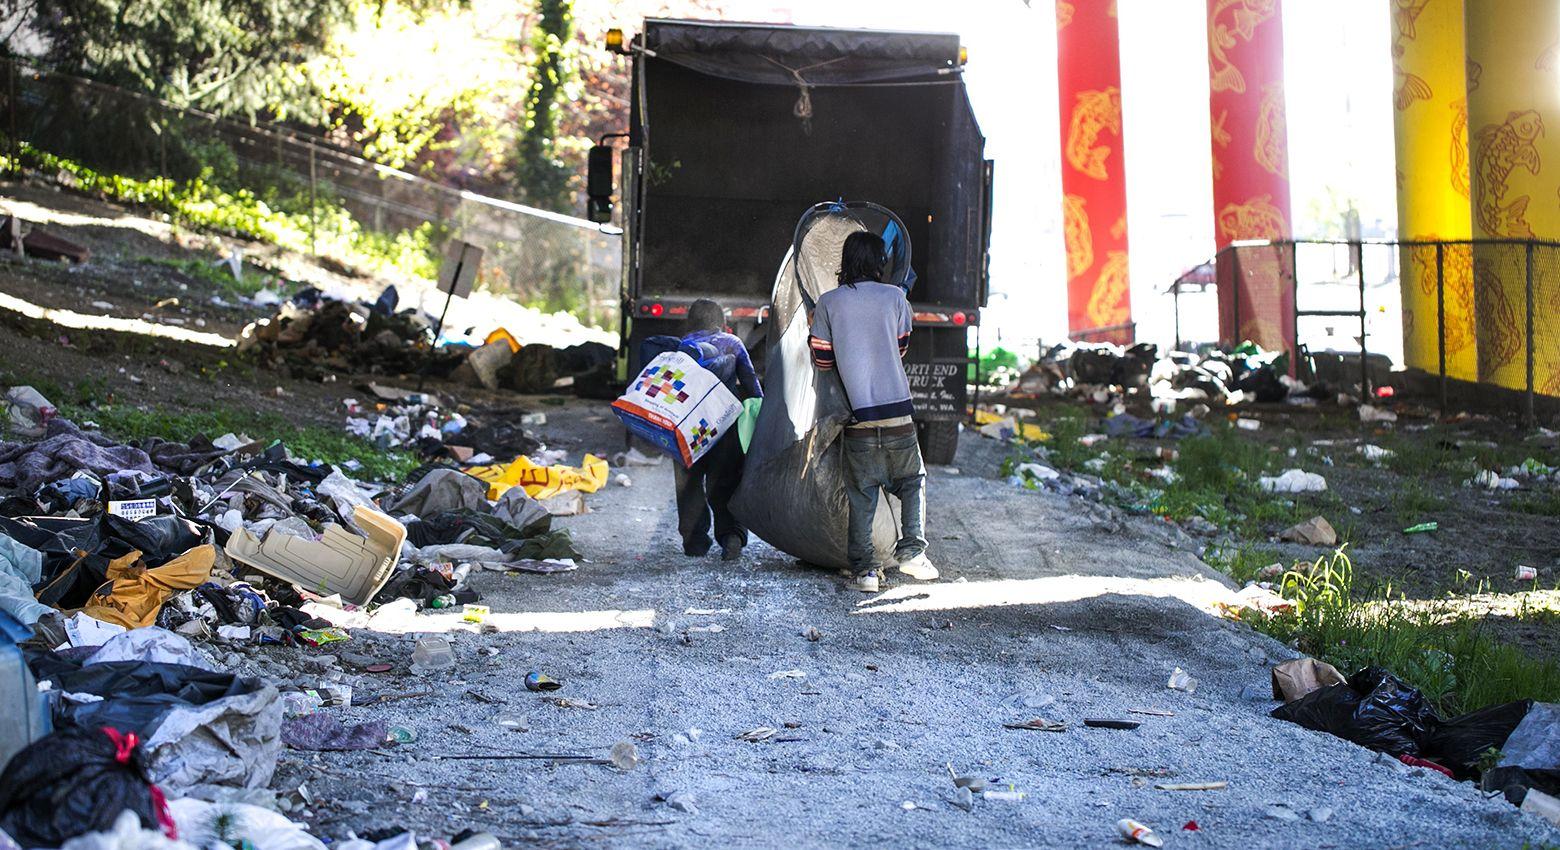 Seattle S Flawed Homeless Sweeps Campers Relocate Their Belongings Across S Jackson St As Maintenance Workers Clear Encampments Seattle News Homeless Sweep